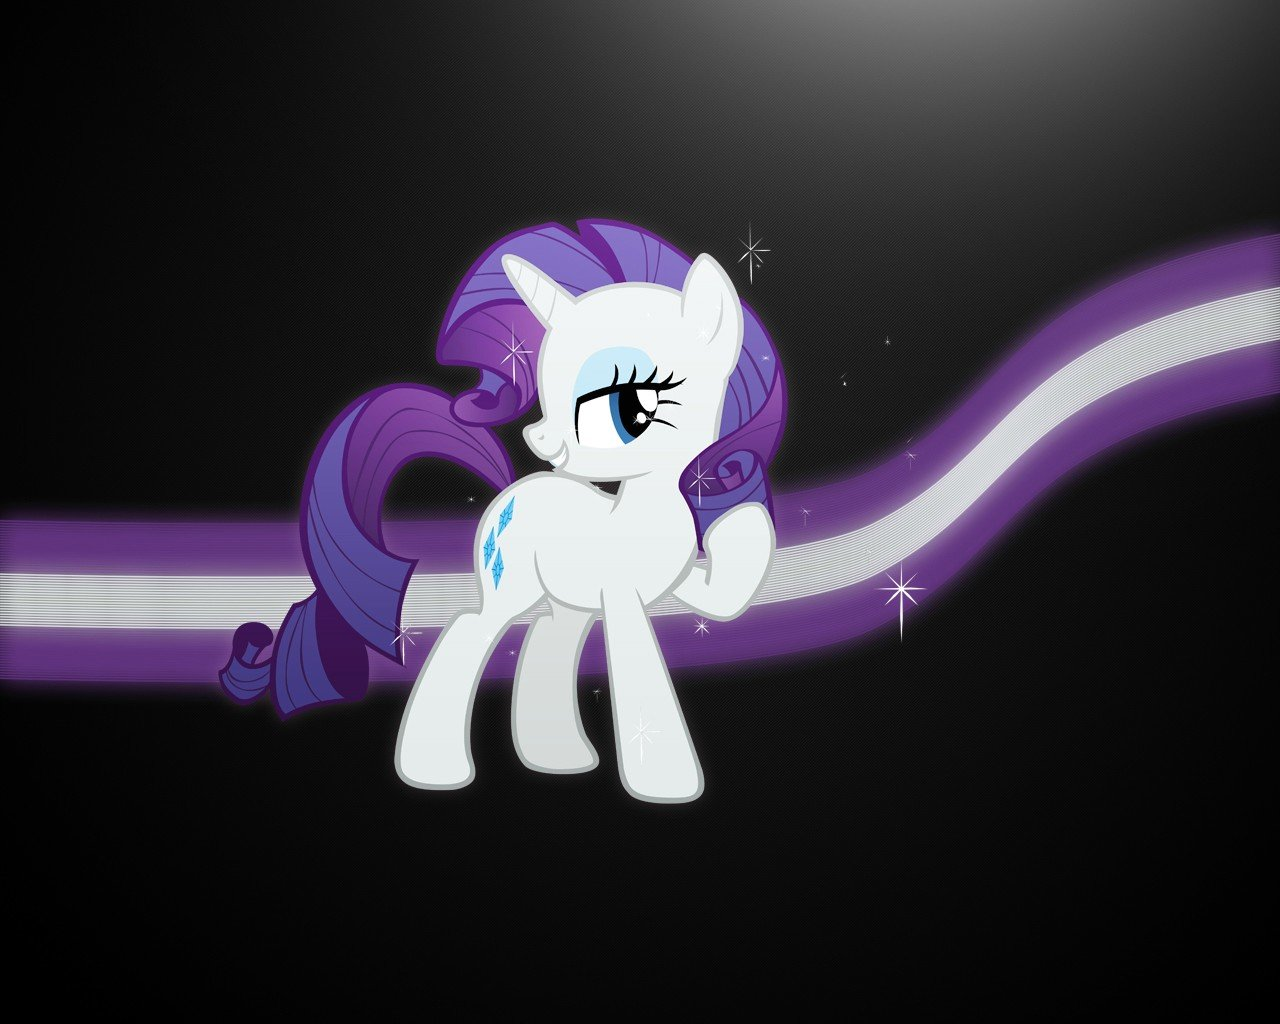 My Little Pony Mlp Wallpapers 1280x1024 Desktop Backgrounds